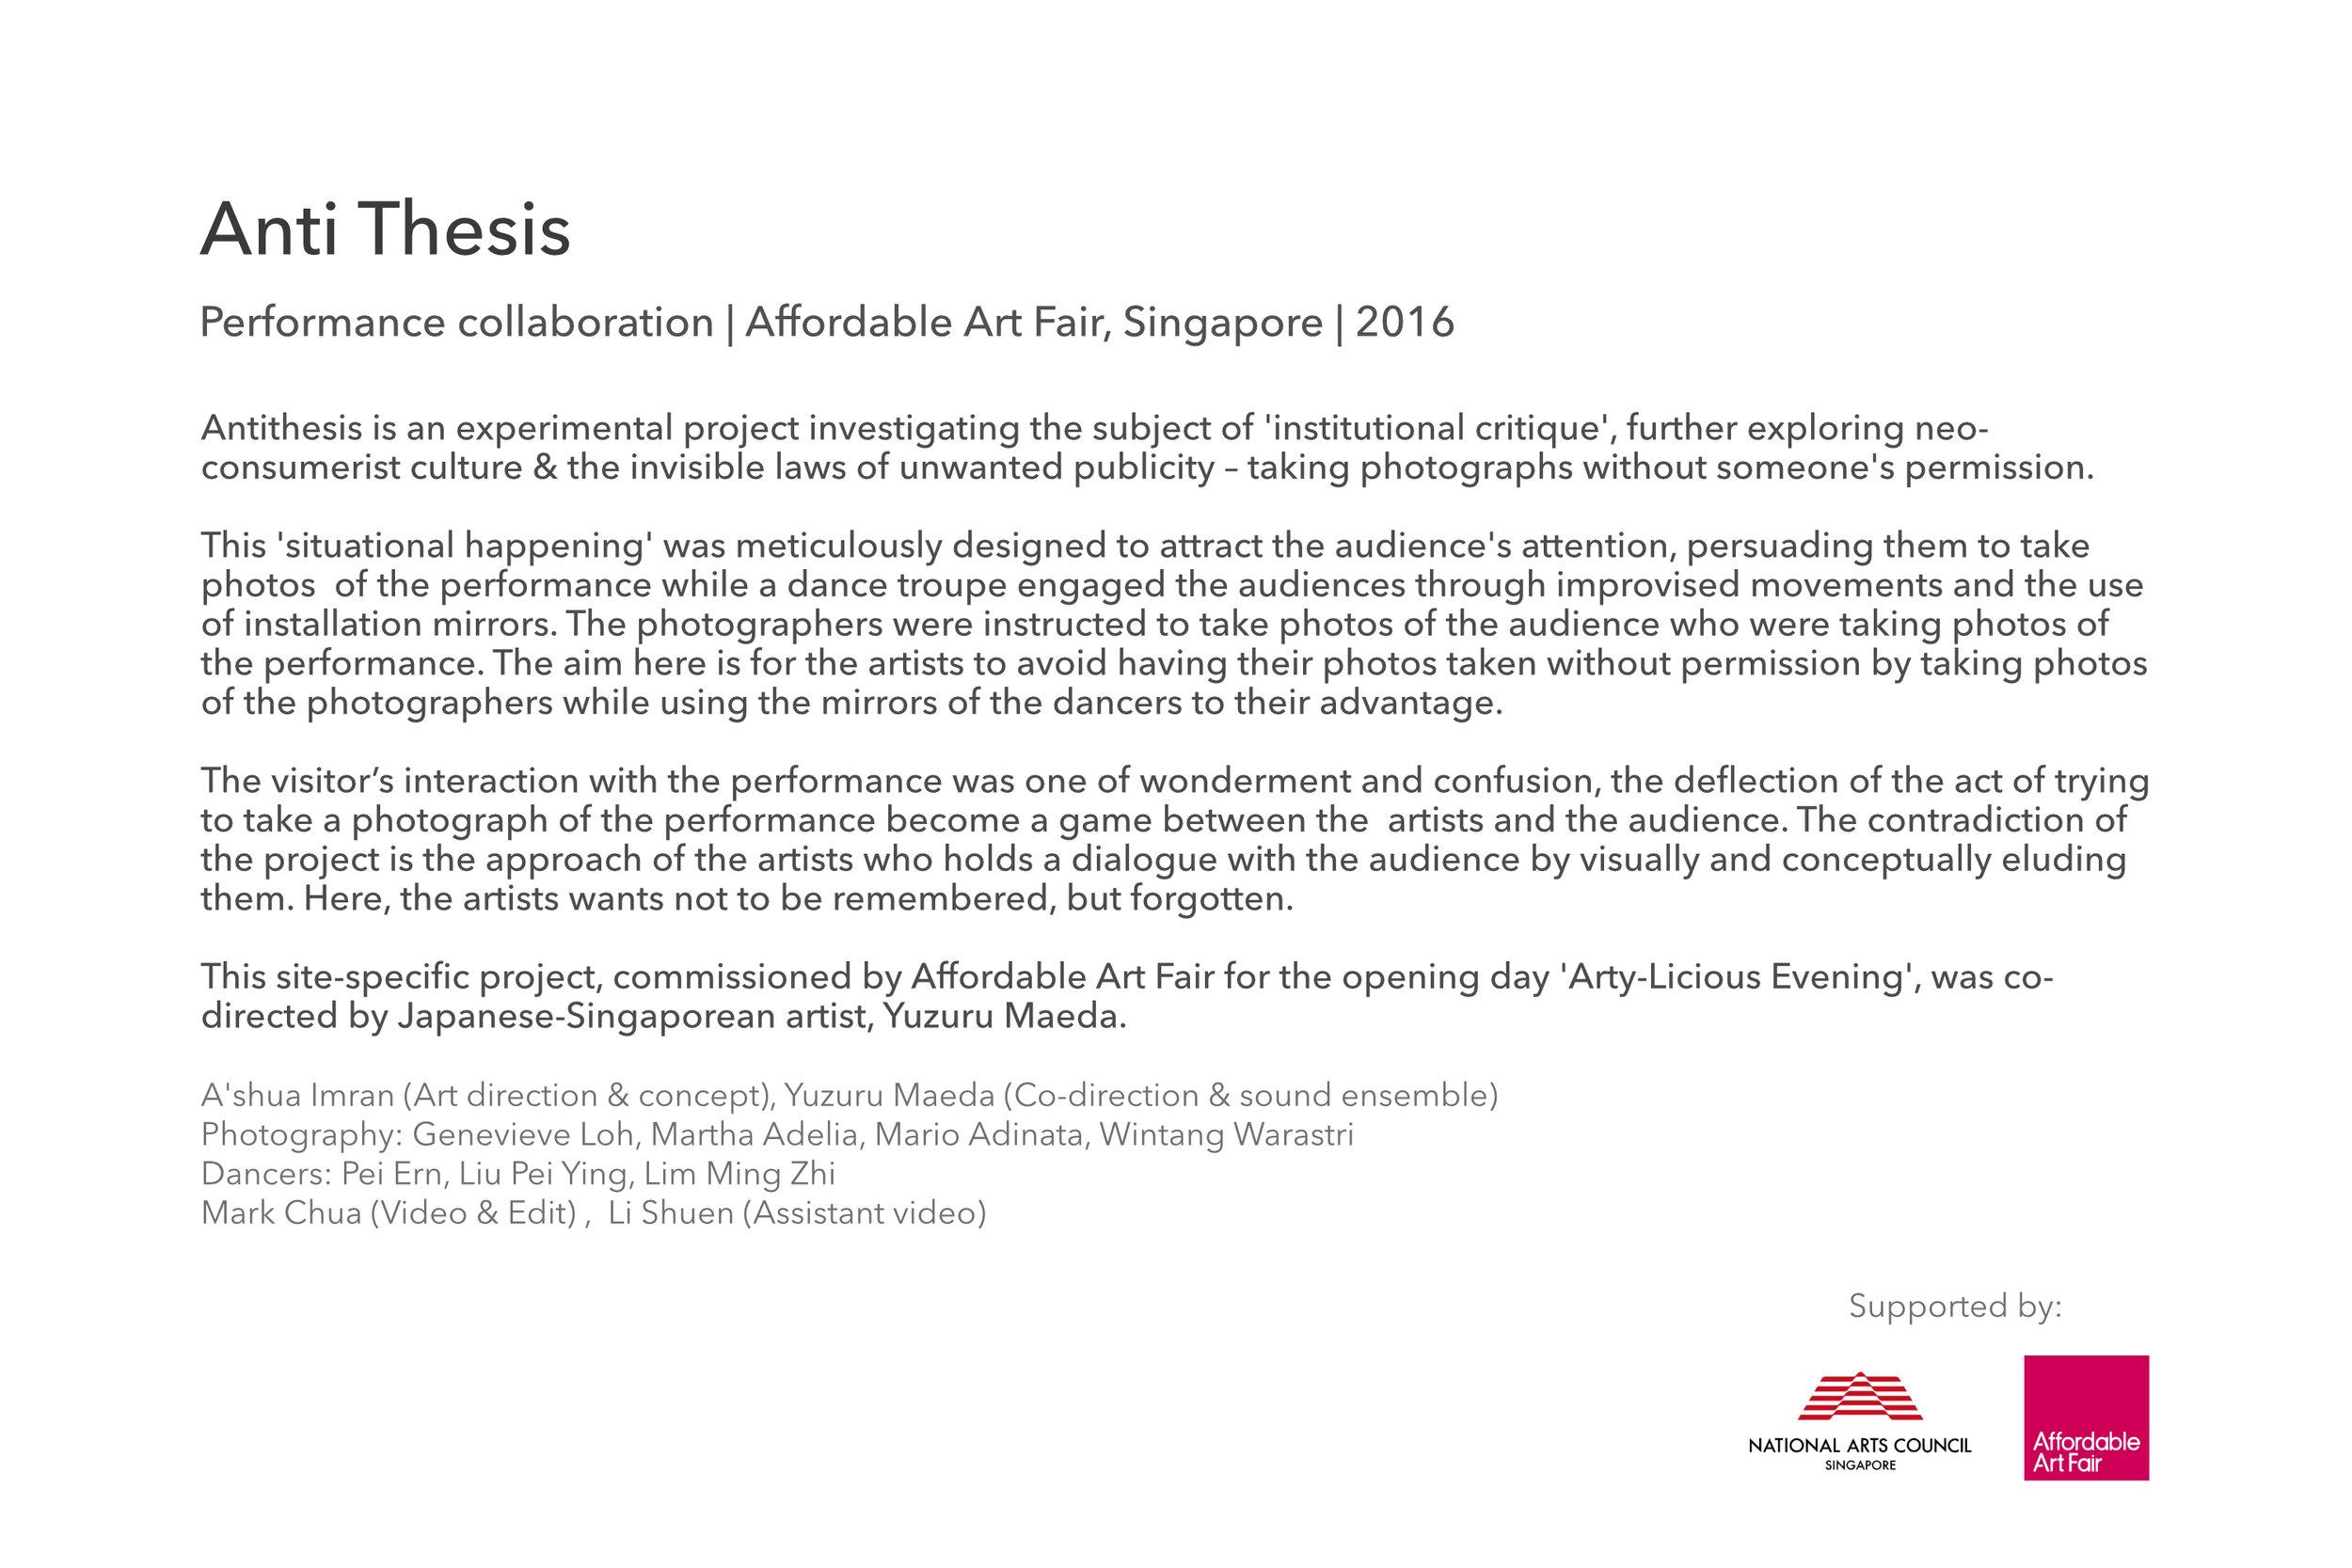 website writeup template (anti thesis).jpg